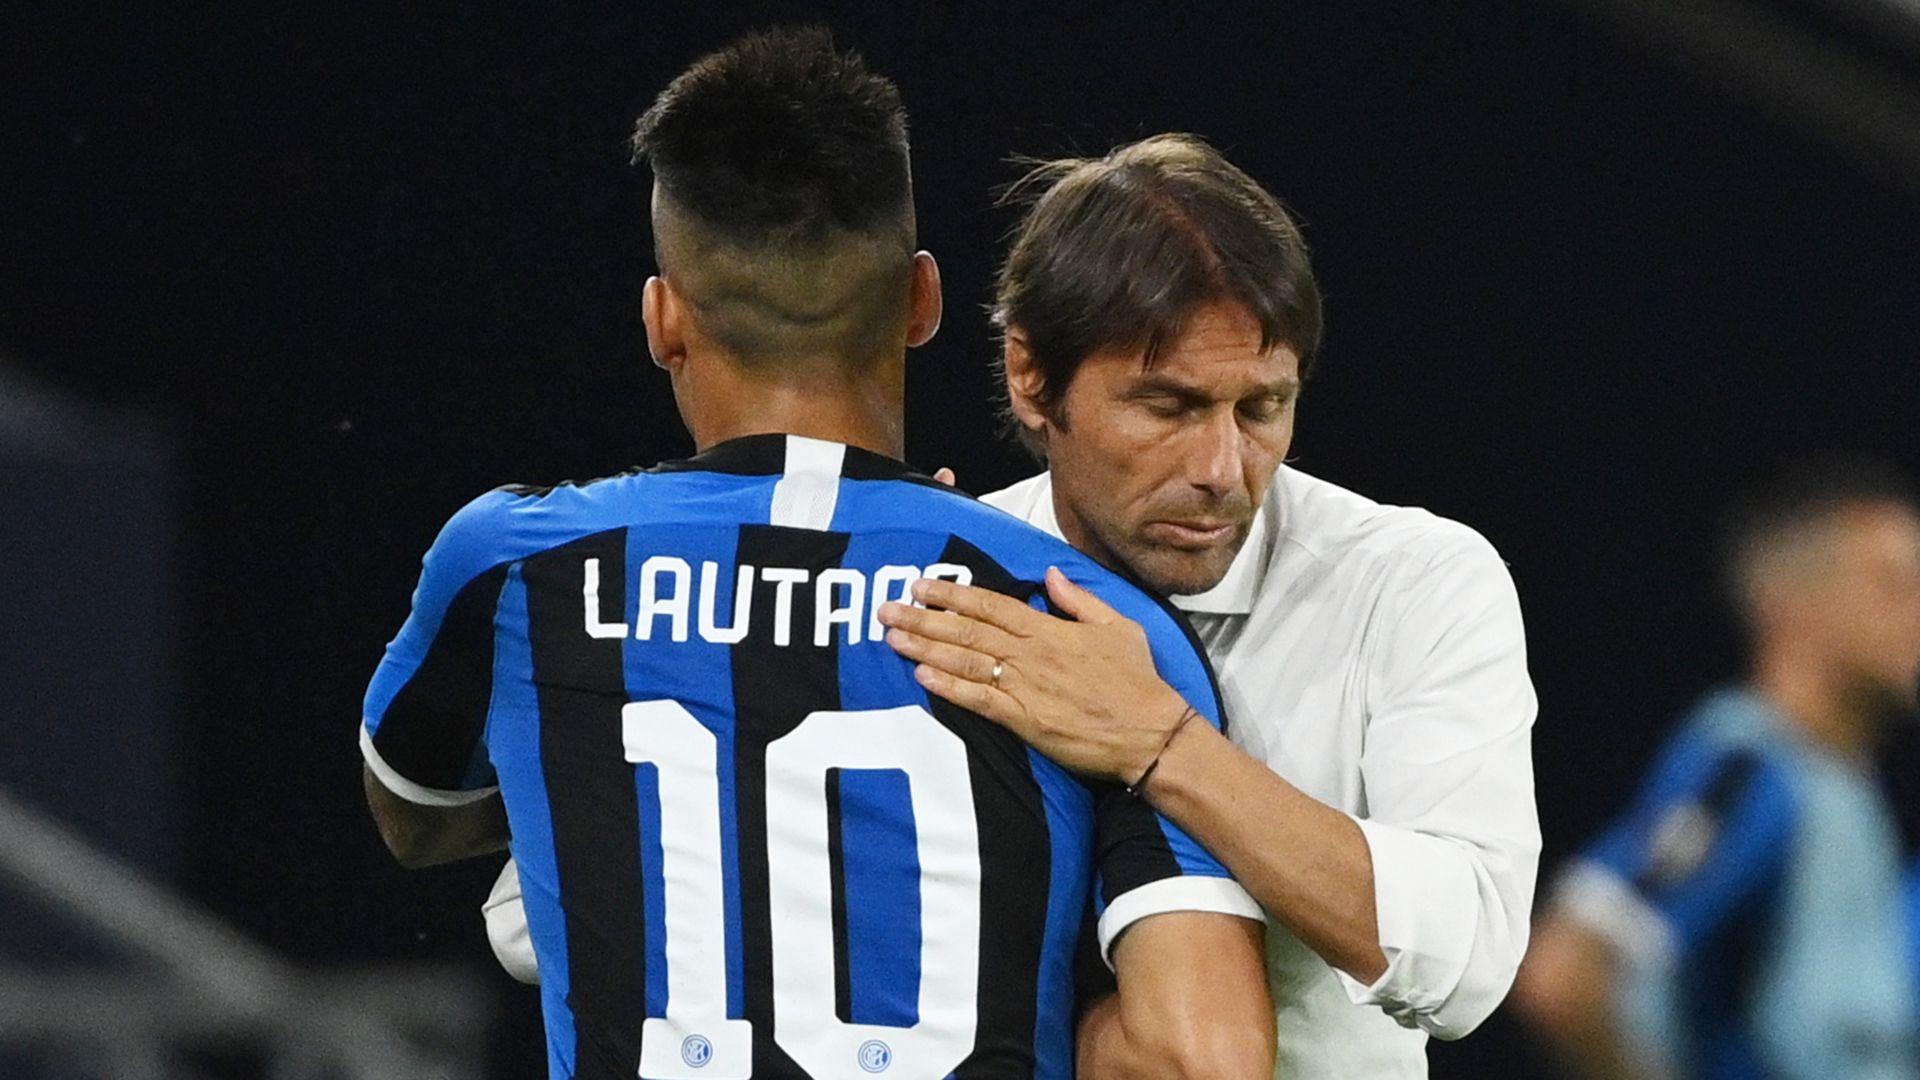 Europa League - Round of 16 - Inter Milan v Getafe